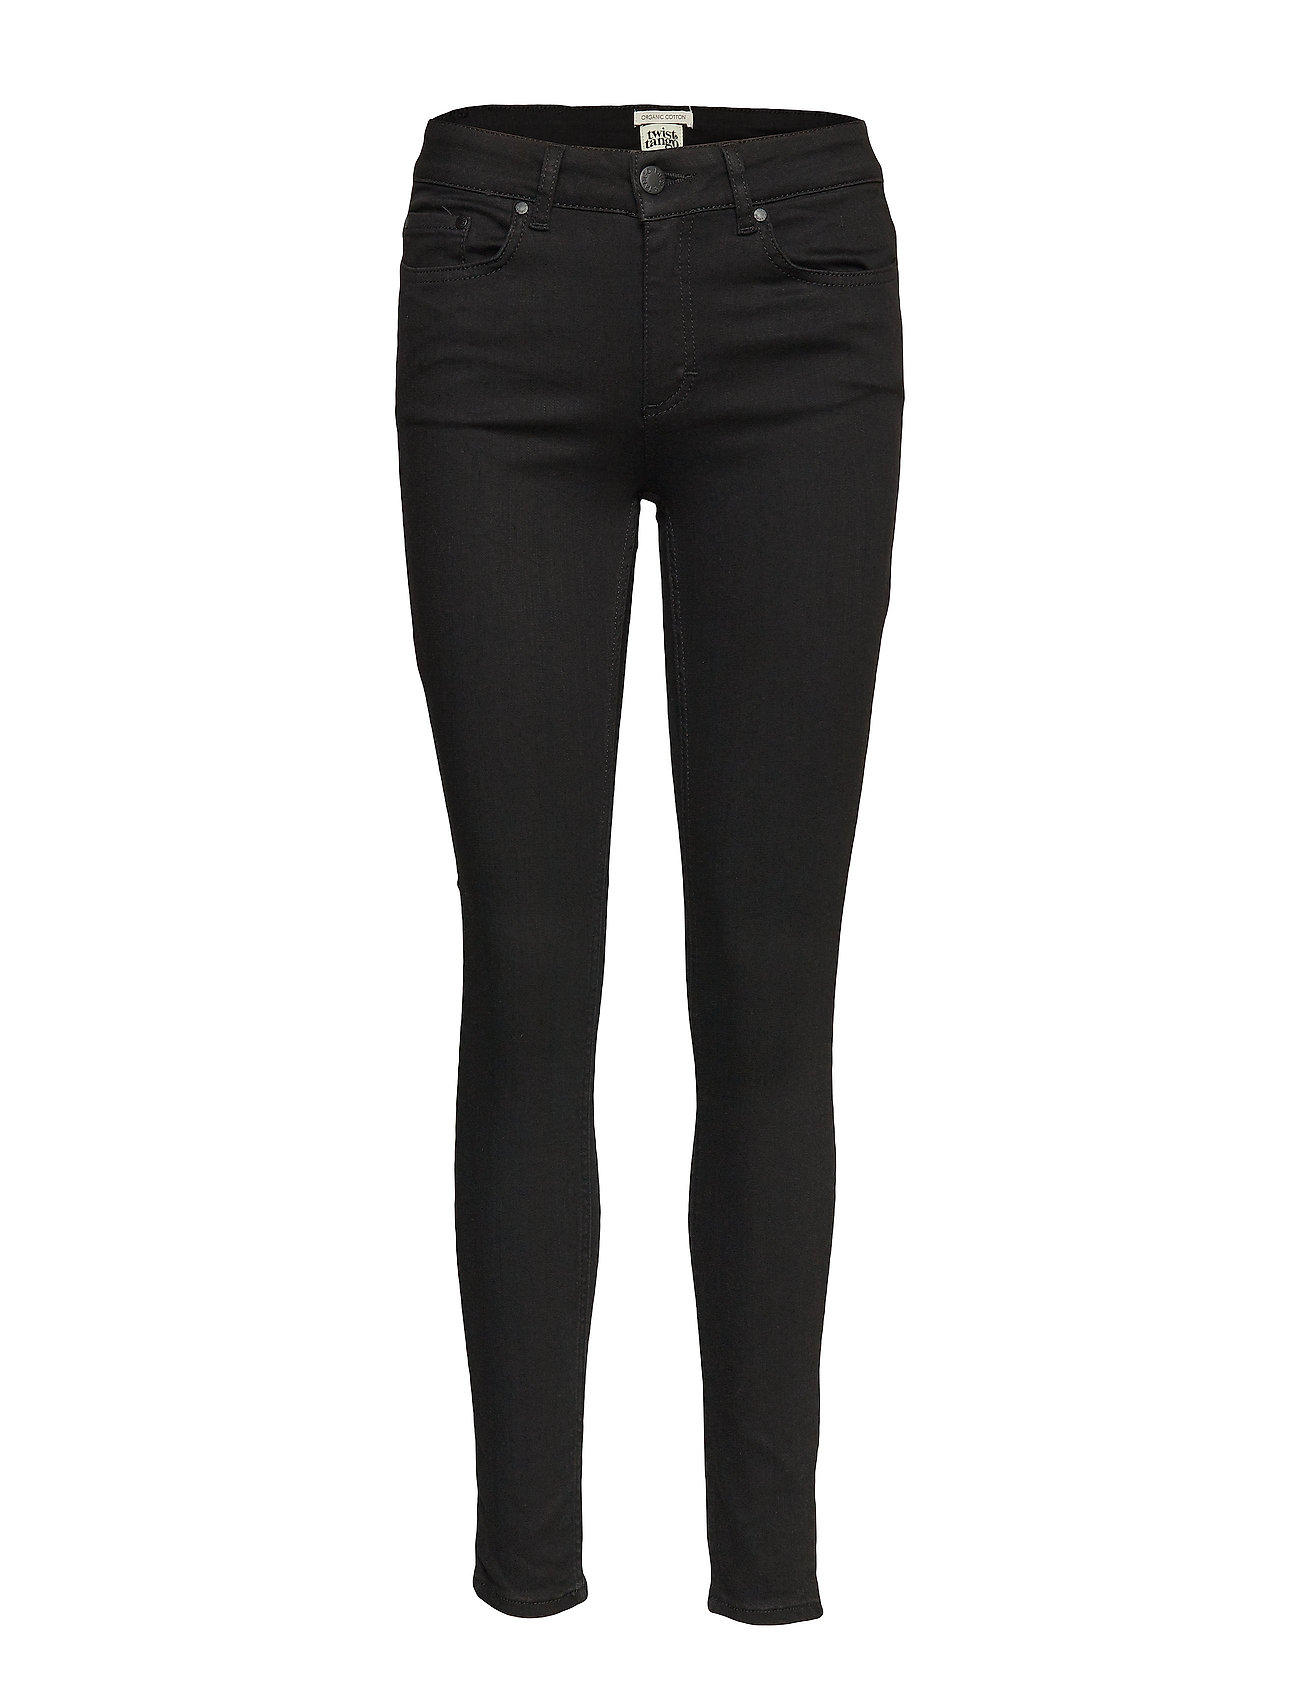 Twist & Tango Julie Jeans Black - BLACK